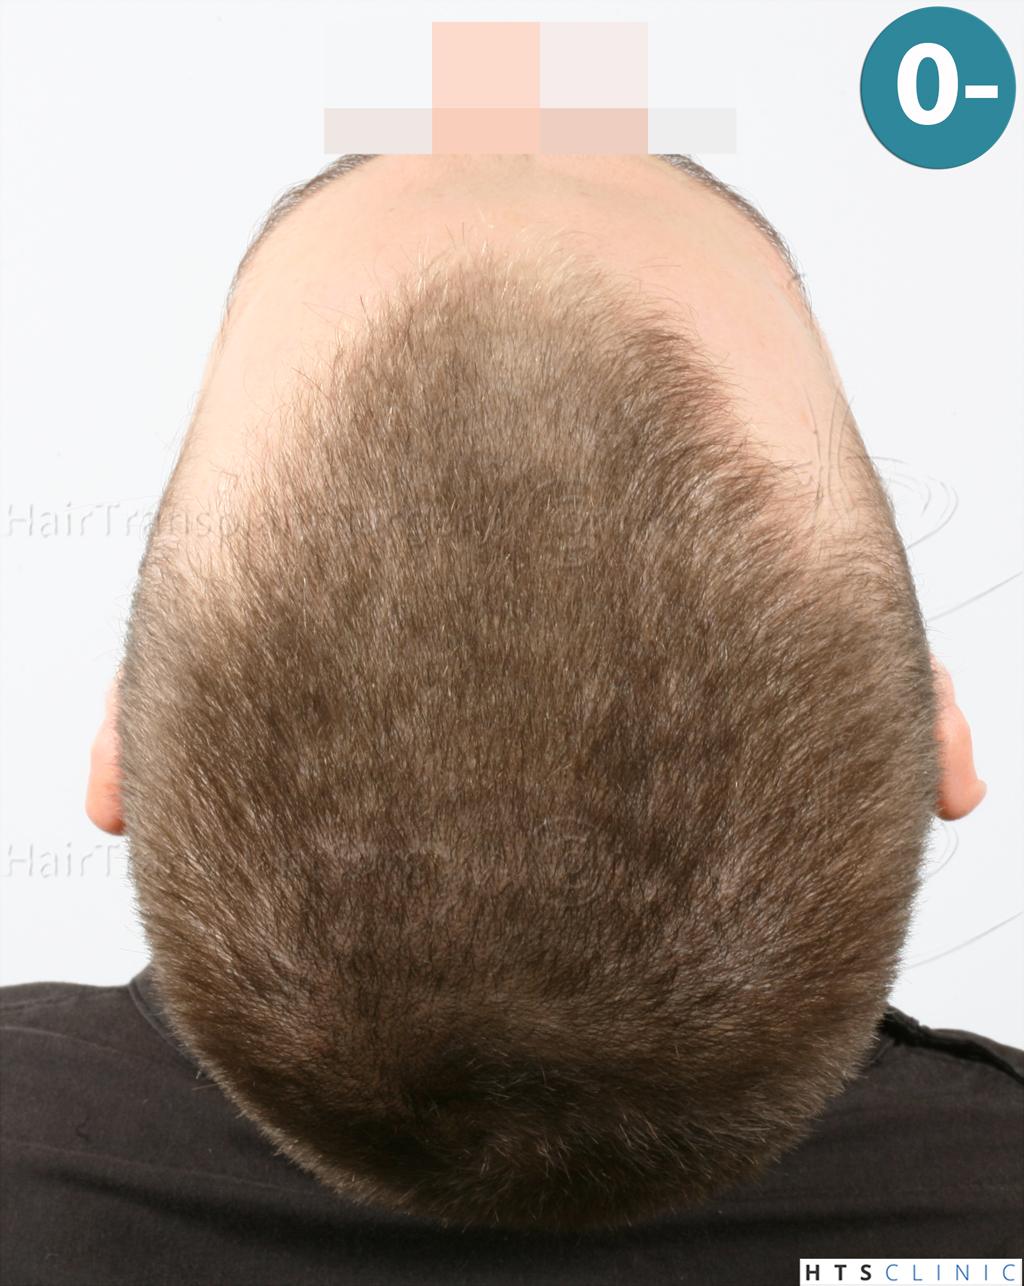 Dr.Devroye-HTS-Clinic-6132-_2011_1232_2889_-FUE-Barbe-et-cheveux-8.jpg